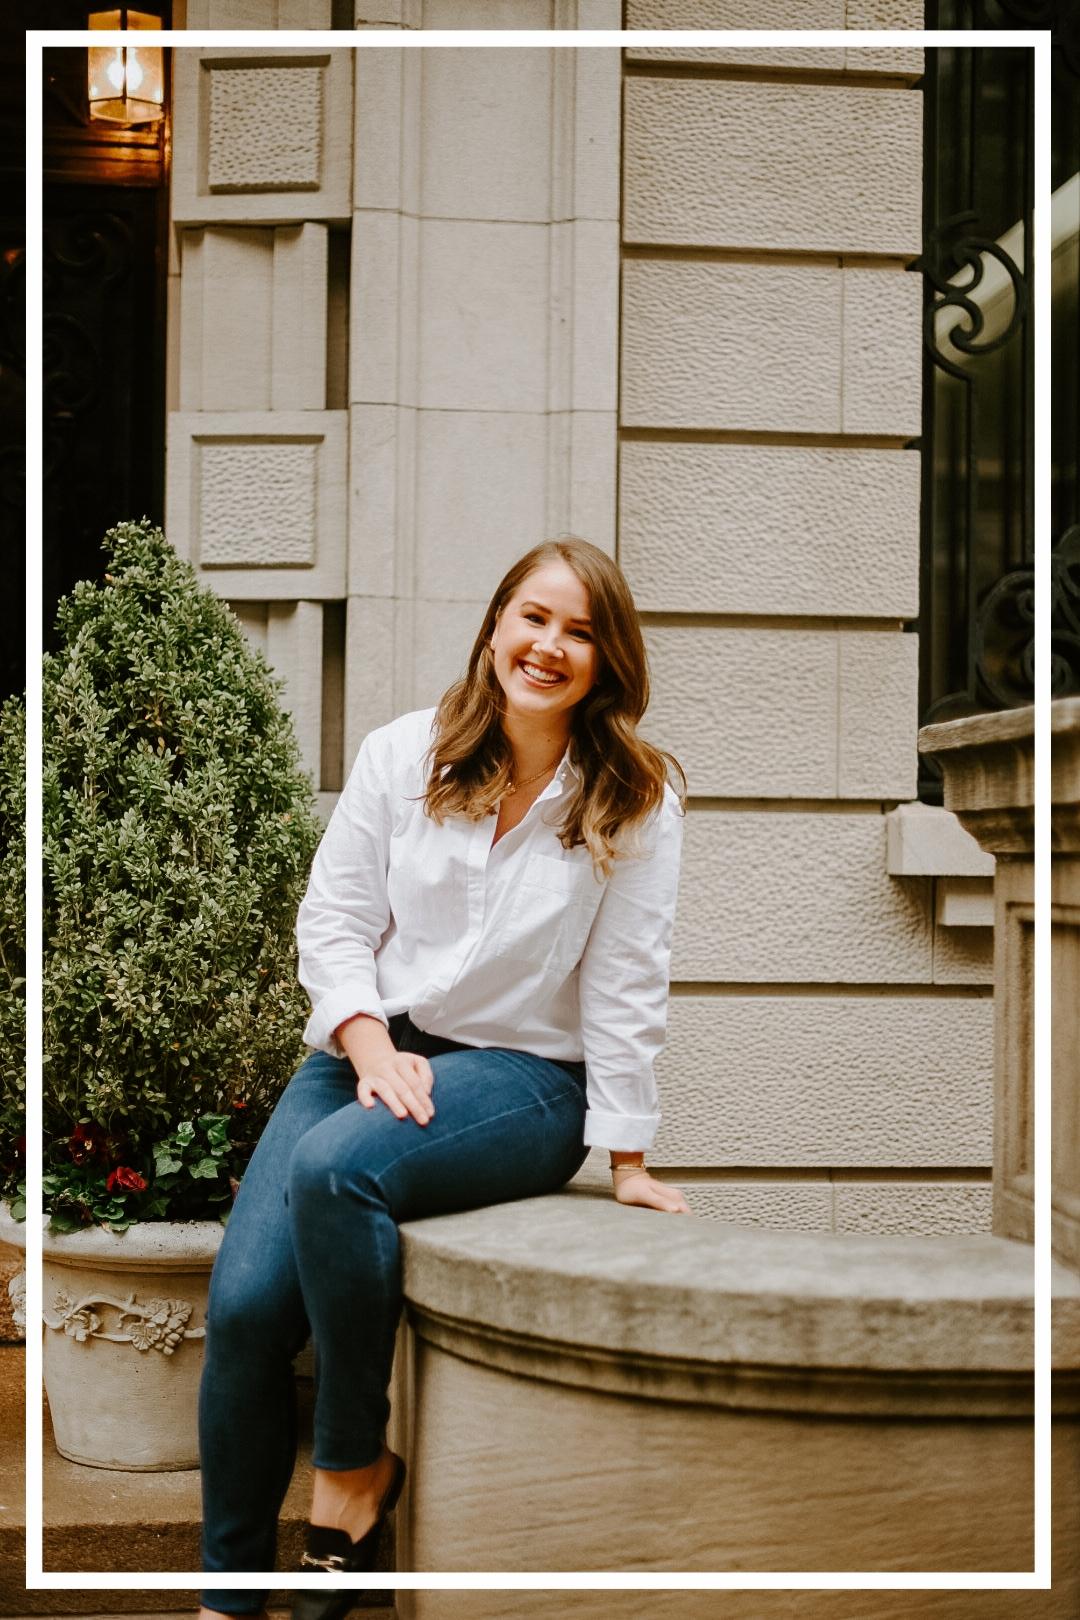 Meet Daulton - Owner | Principal Planner + Designer